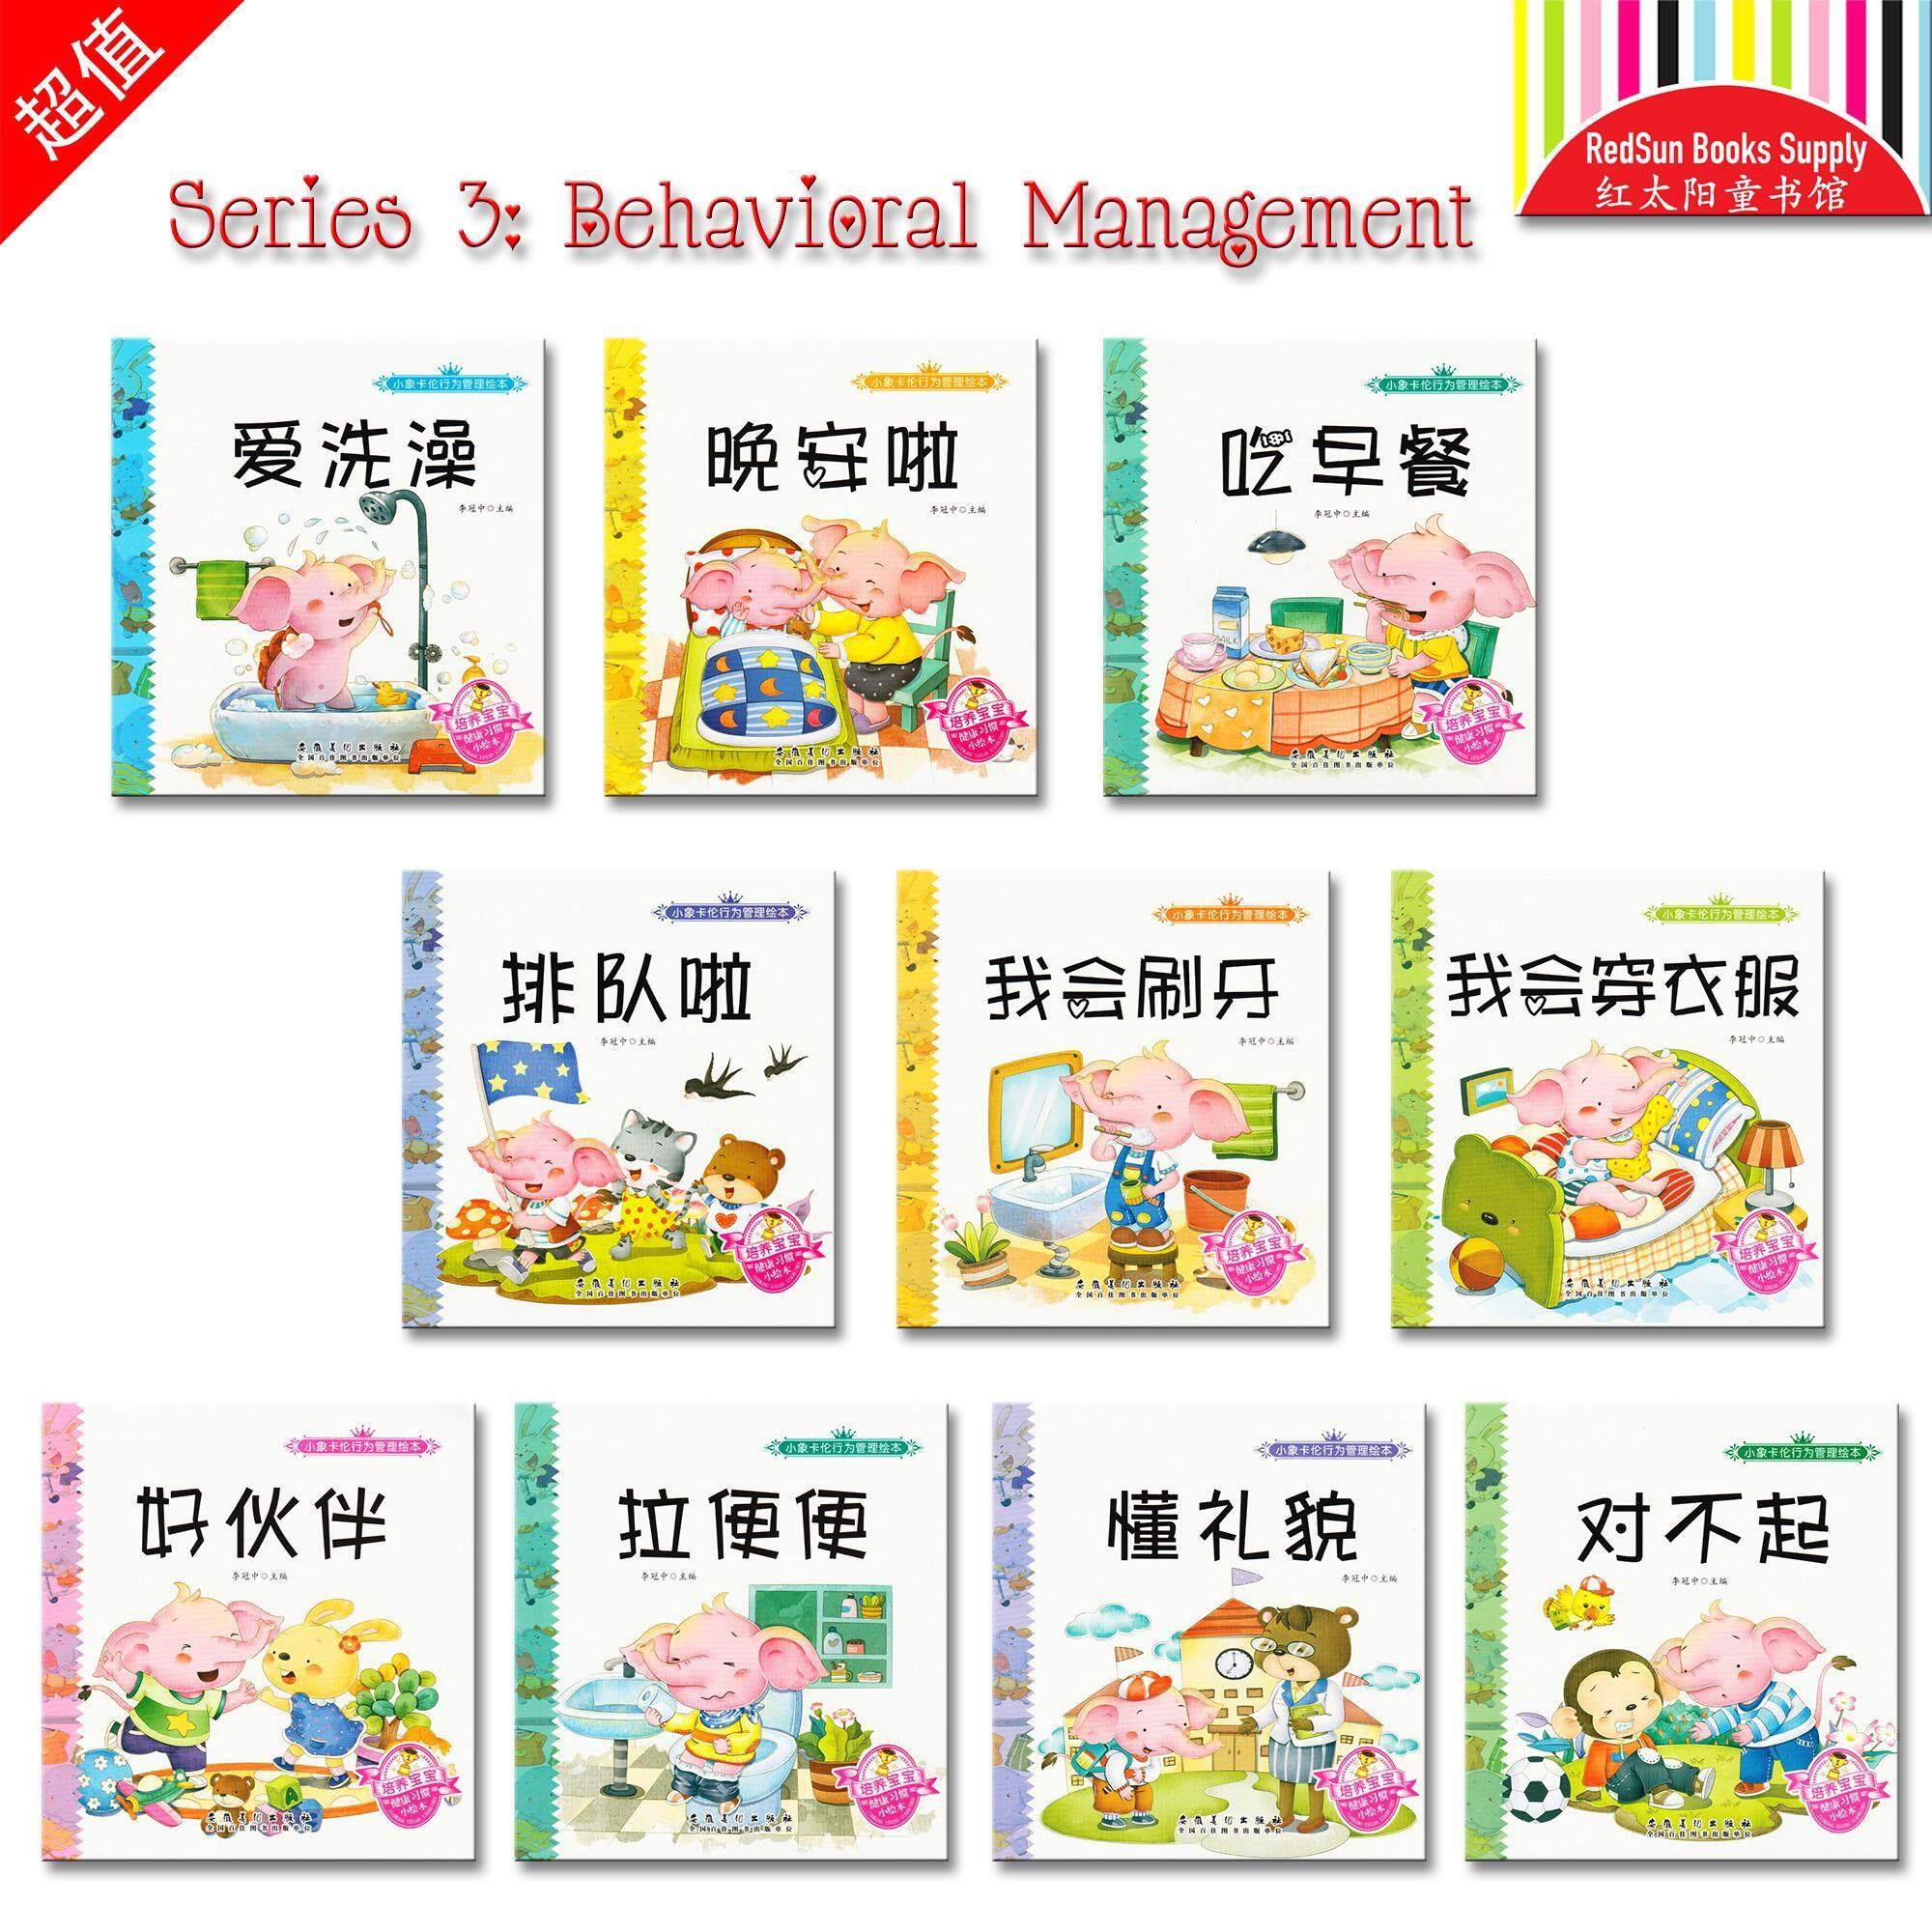 Double Language Behavioral Management Children Picture Book (10 Books)